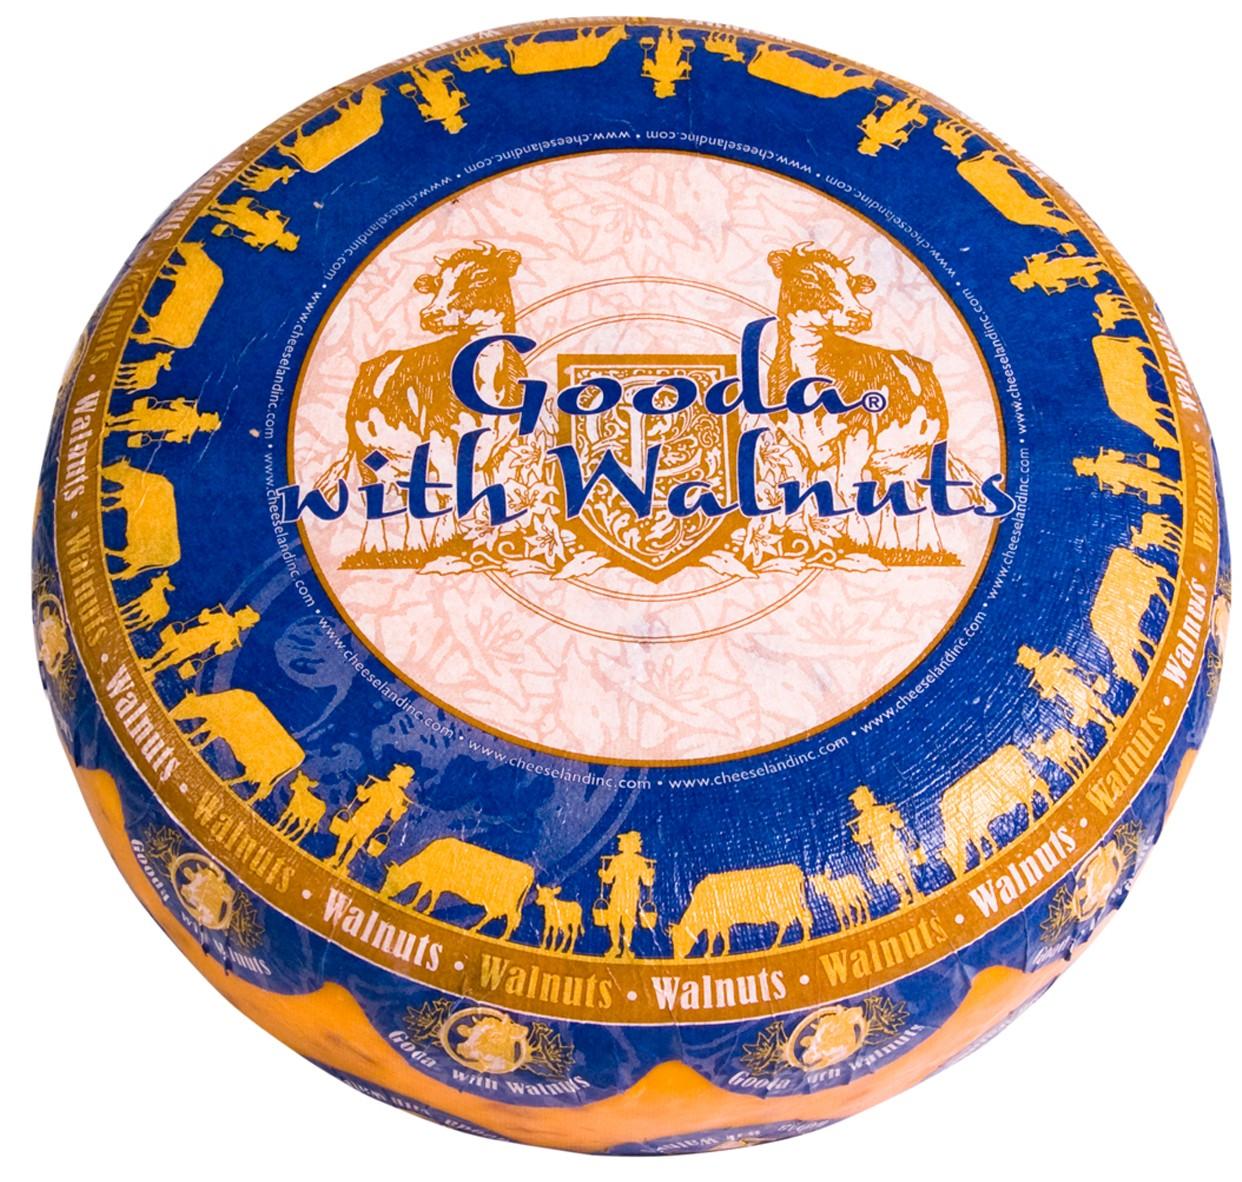 Сыр Gooda с грецким орехом Cheeseland фото